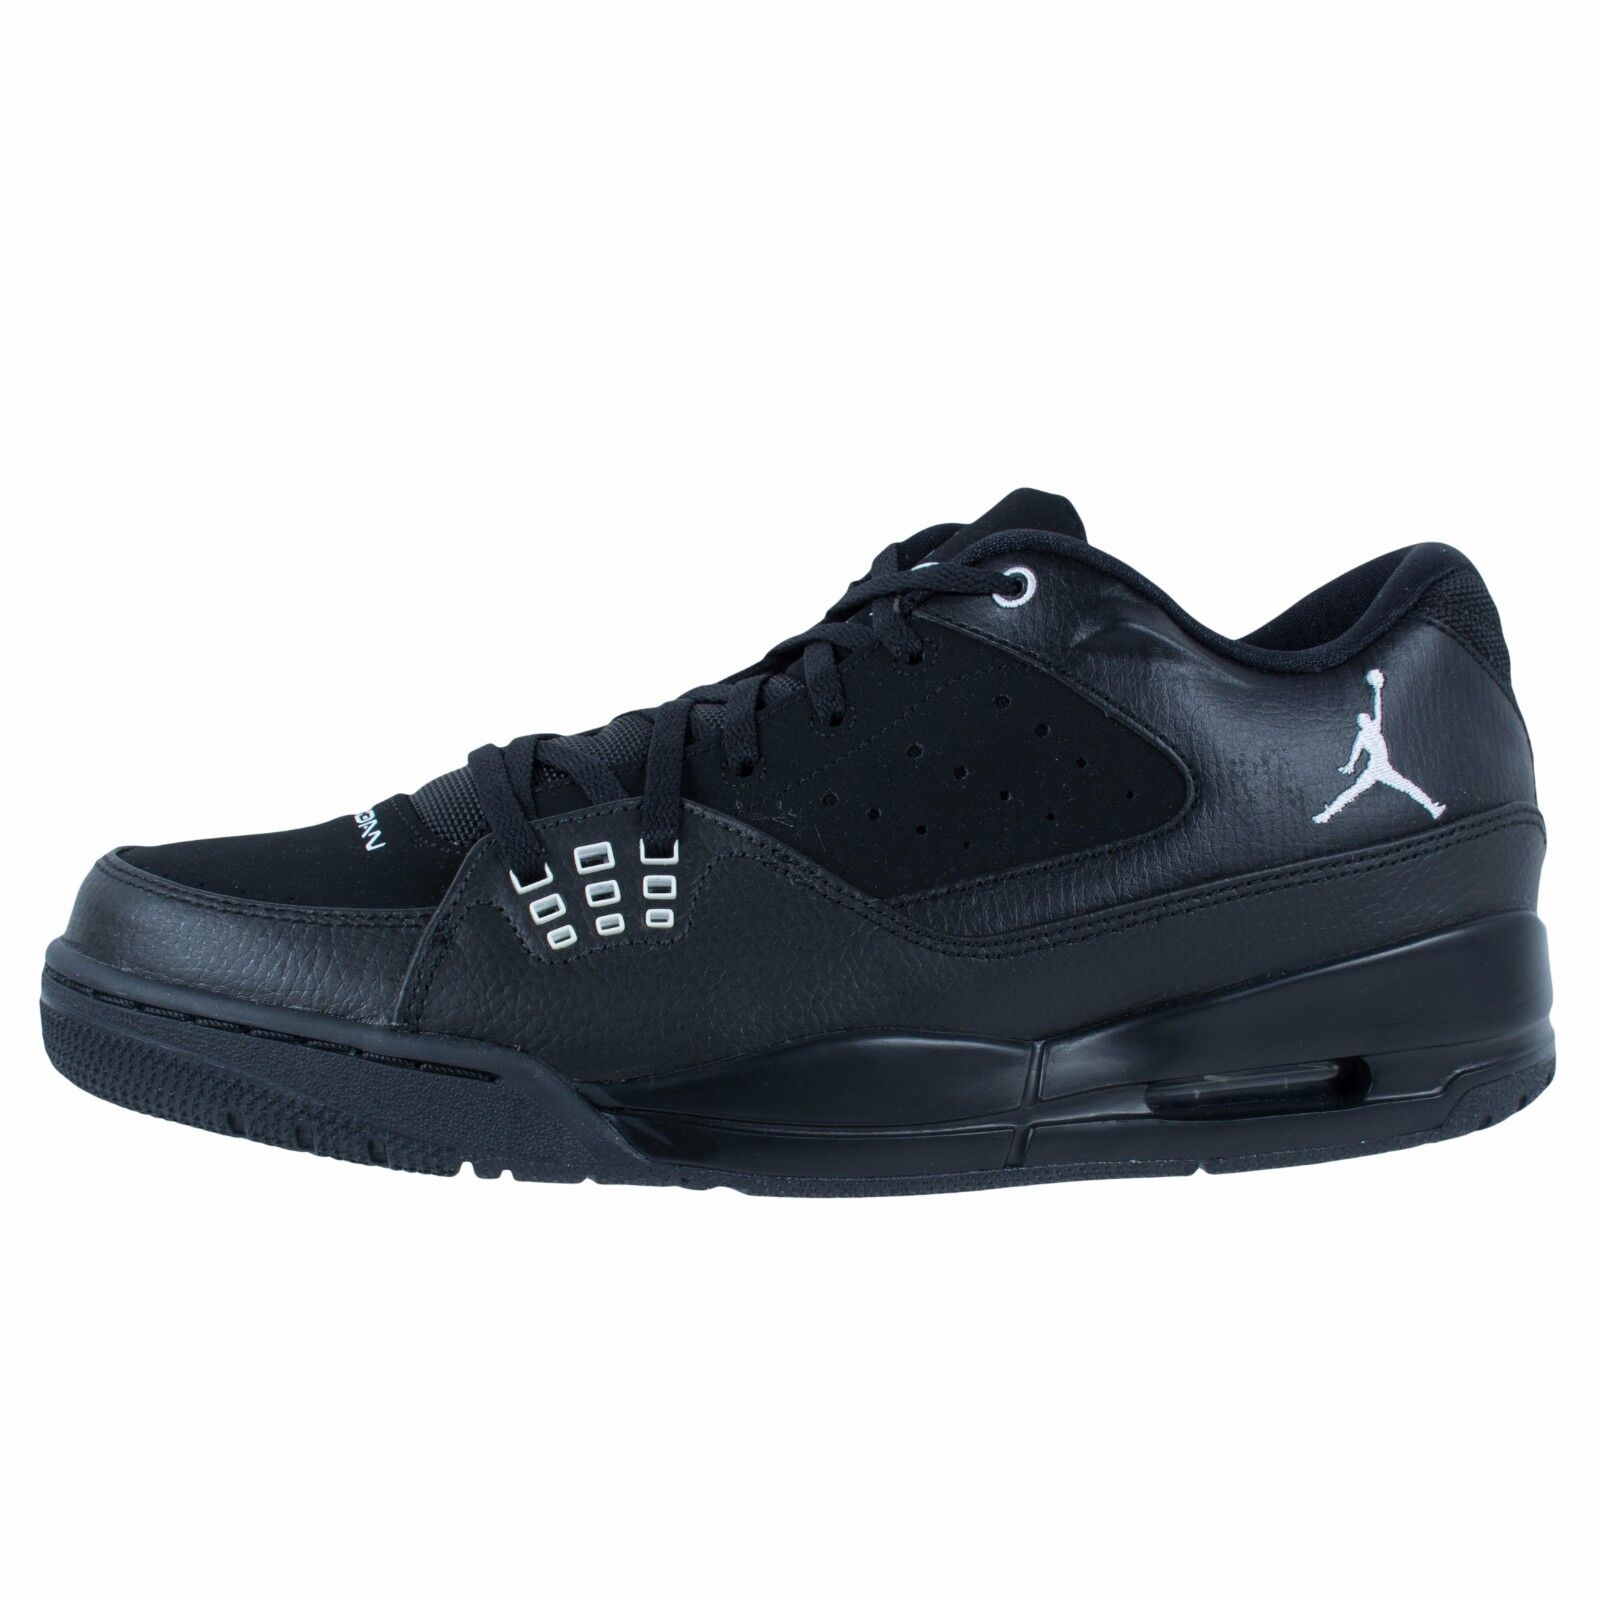 Seasonal price cuts, discount benefits Nike Jordan SC-1 Low Black Leather 599929-010 Shoes Men